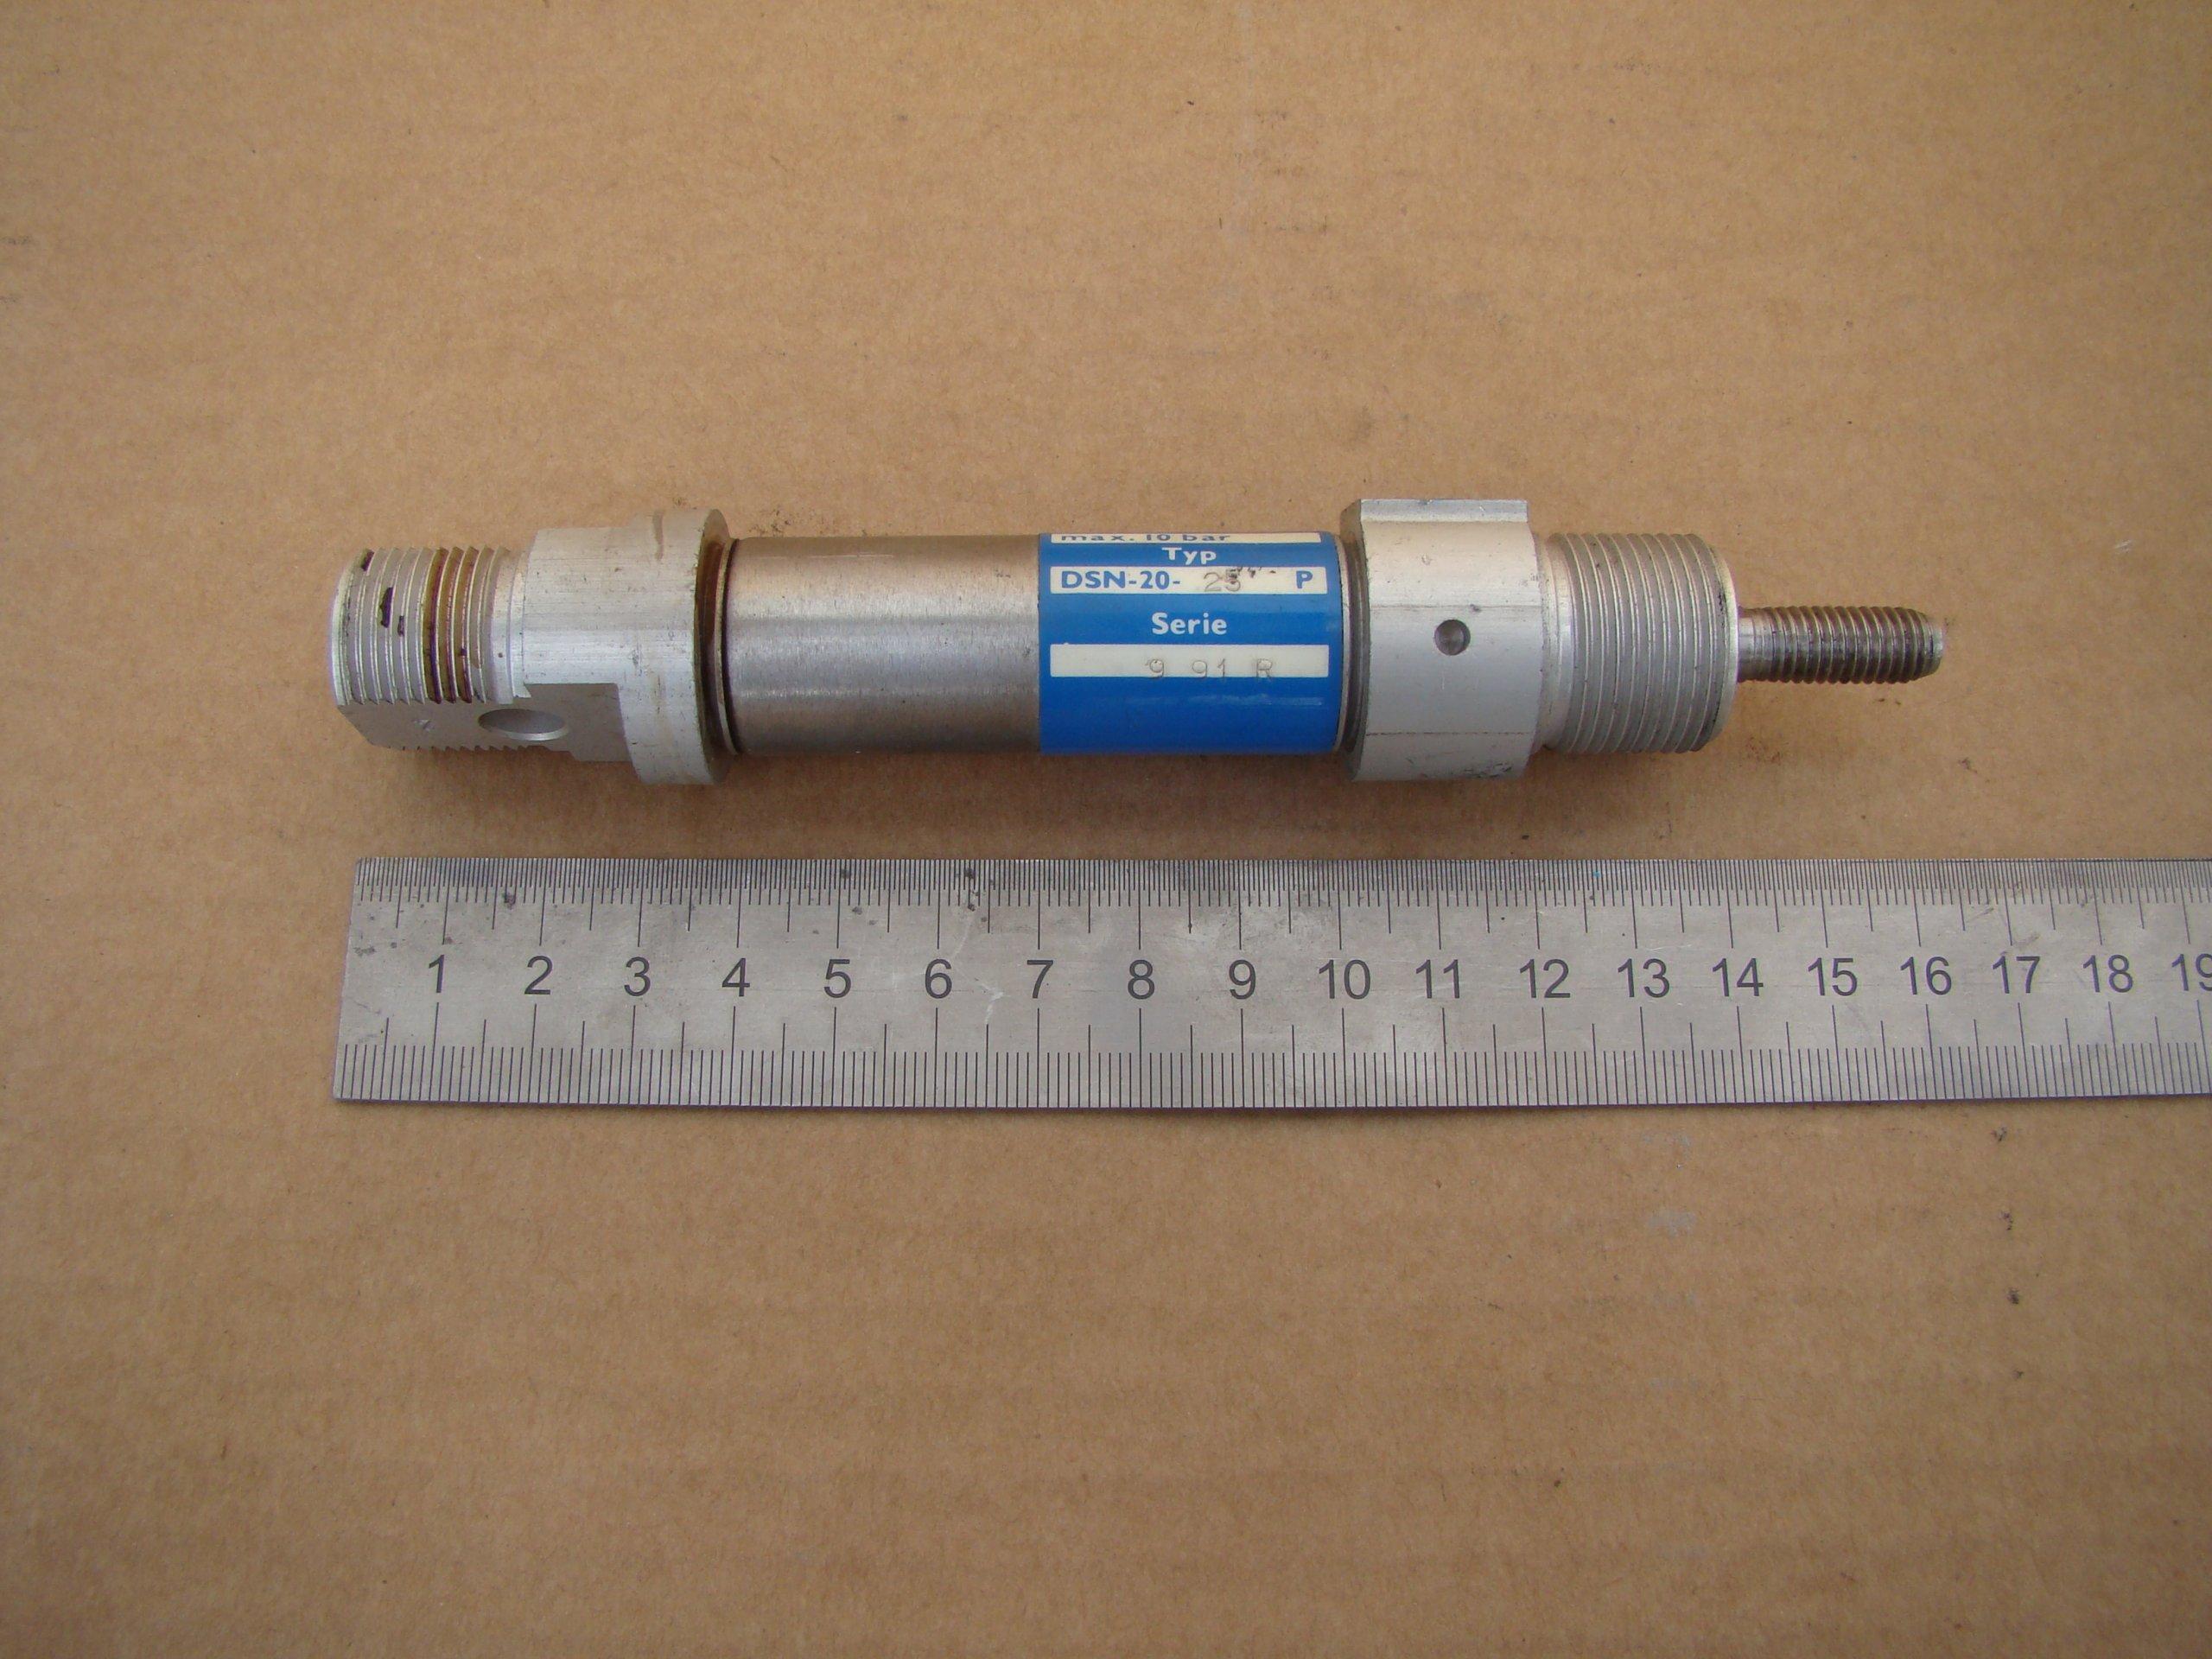 FESTO dsn-12-25p Cylindre